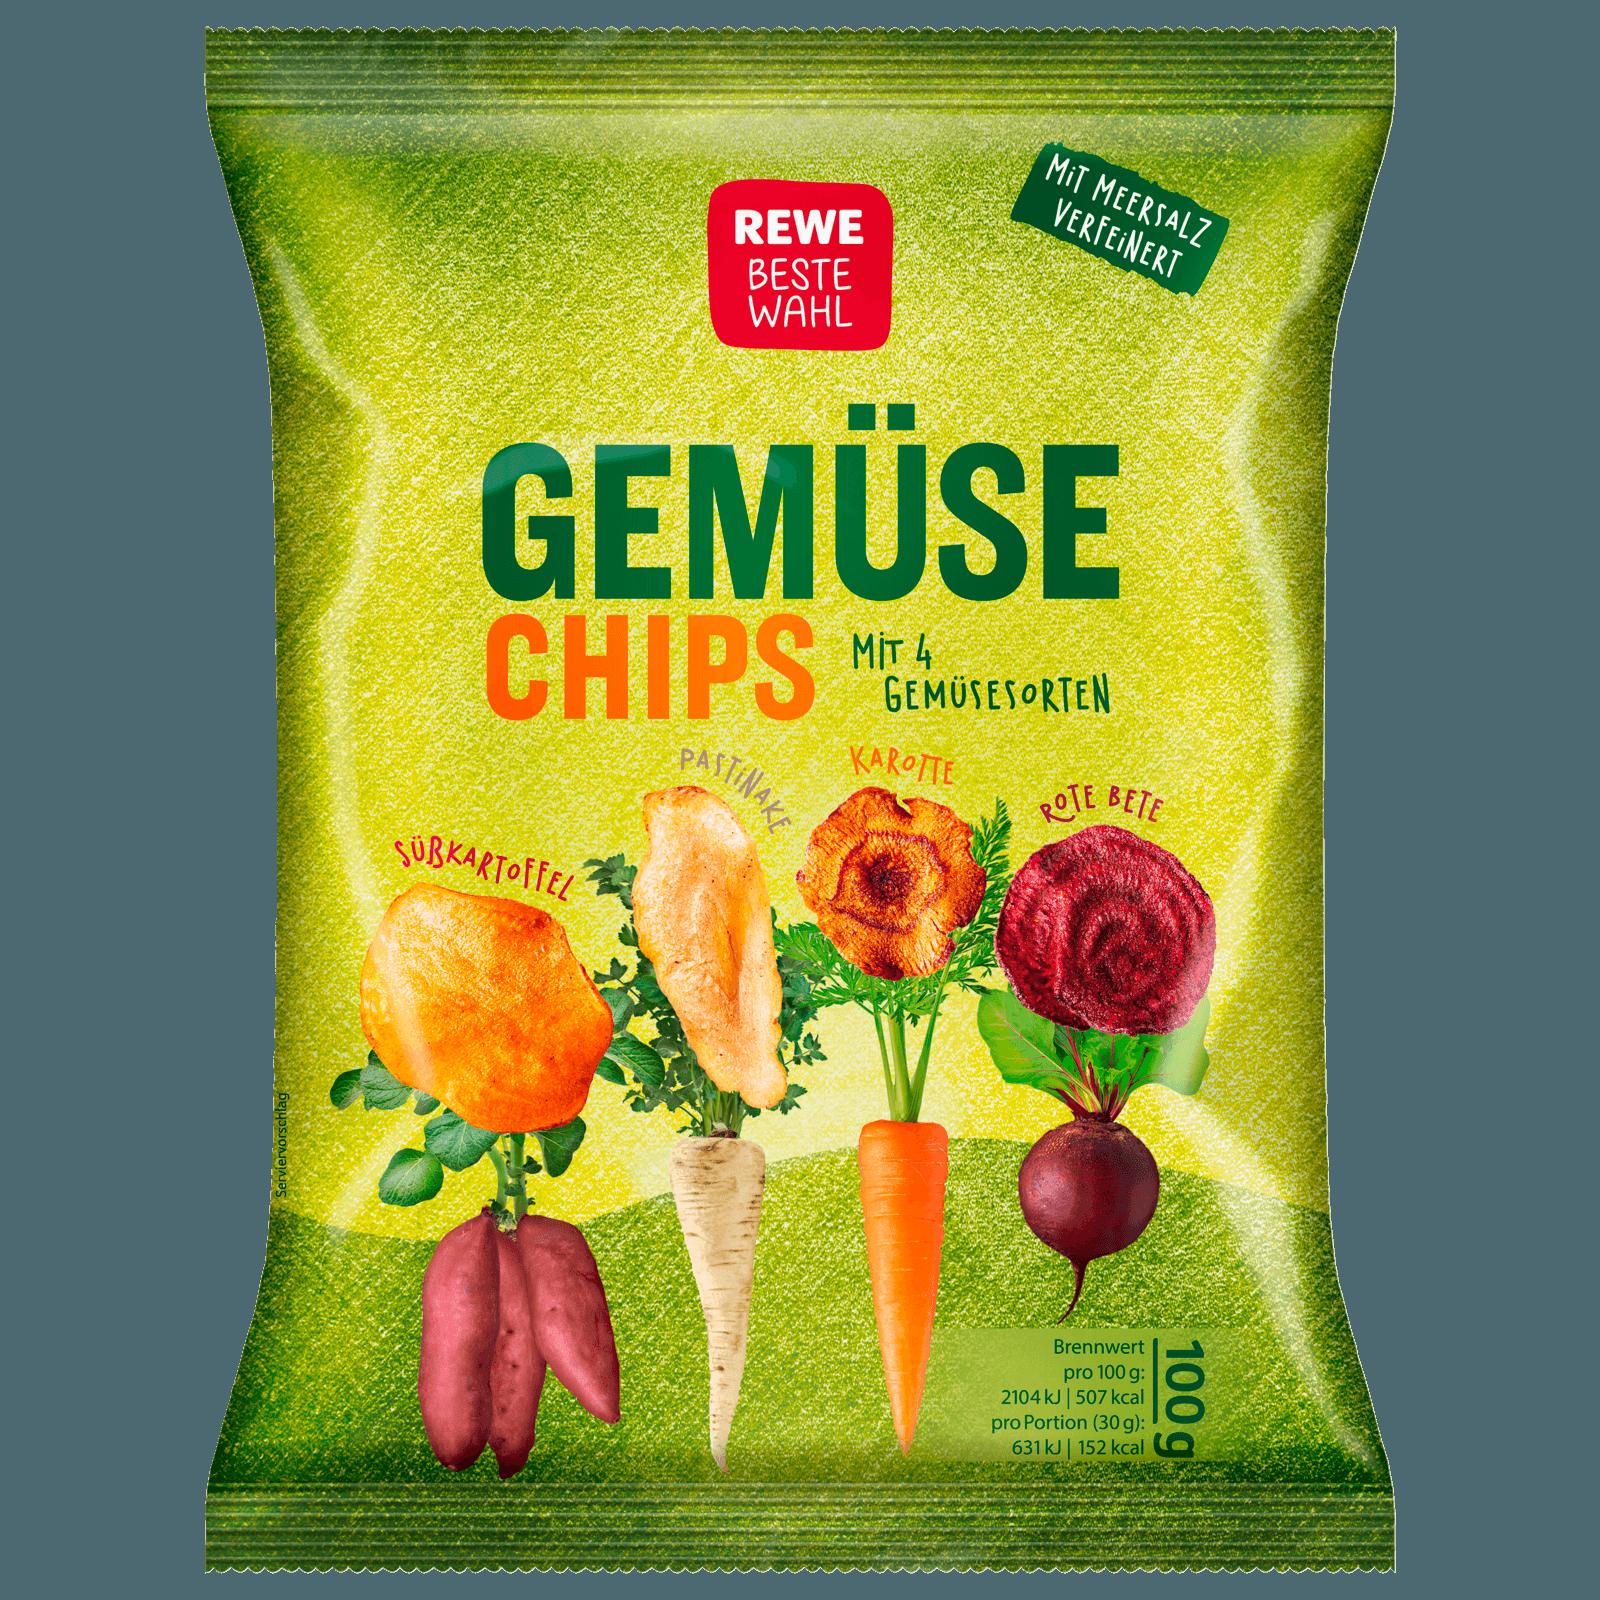 REWE Beste Wahl Gemüsechips gesalzen 100g